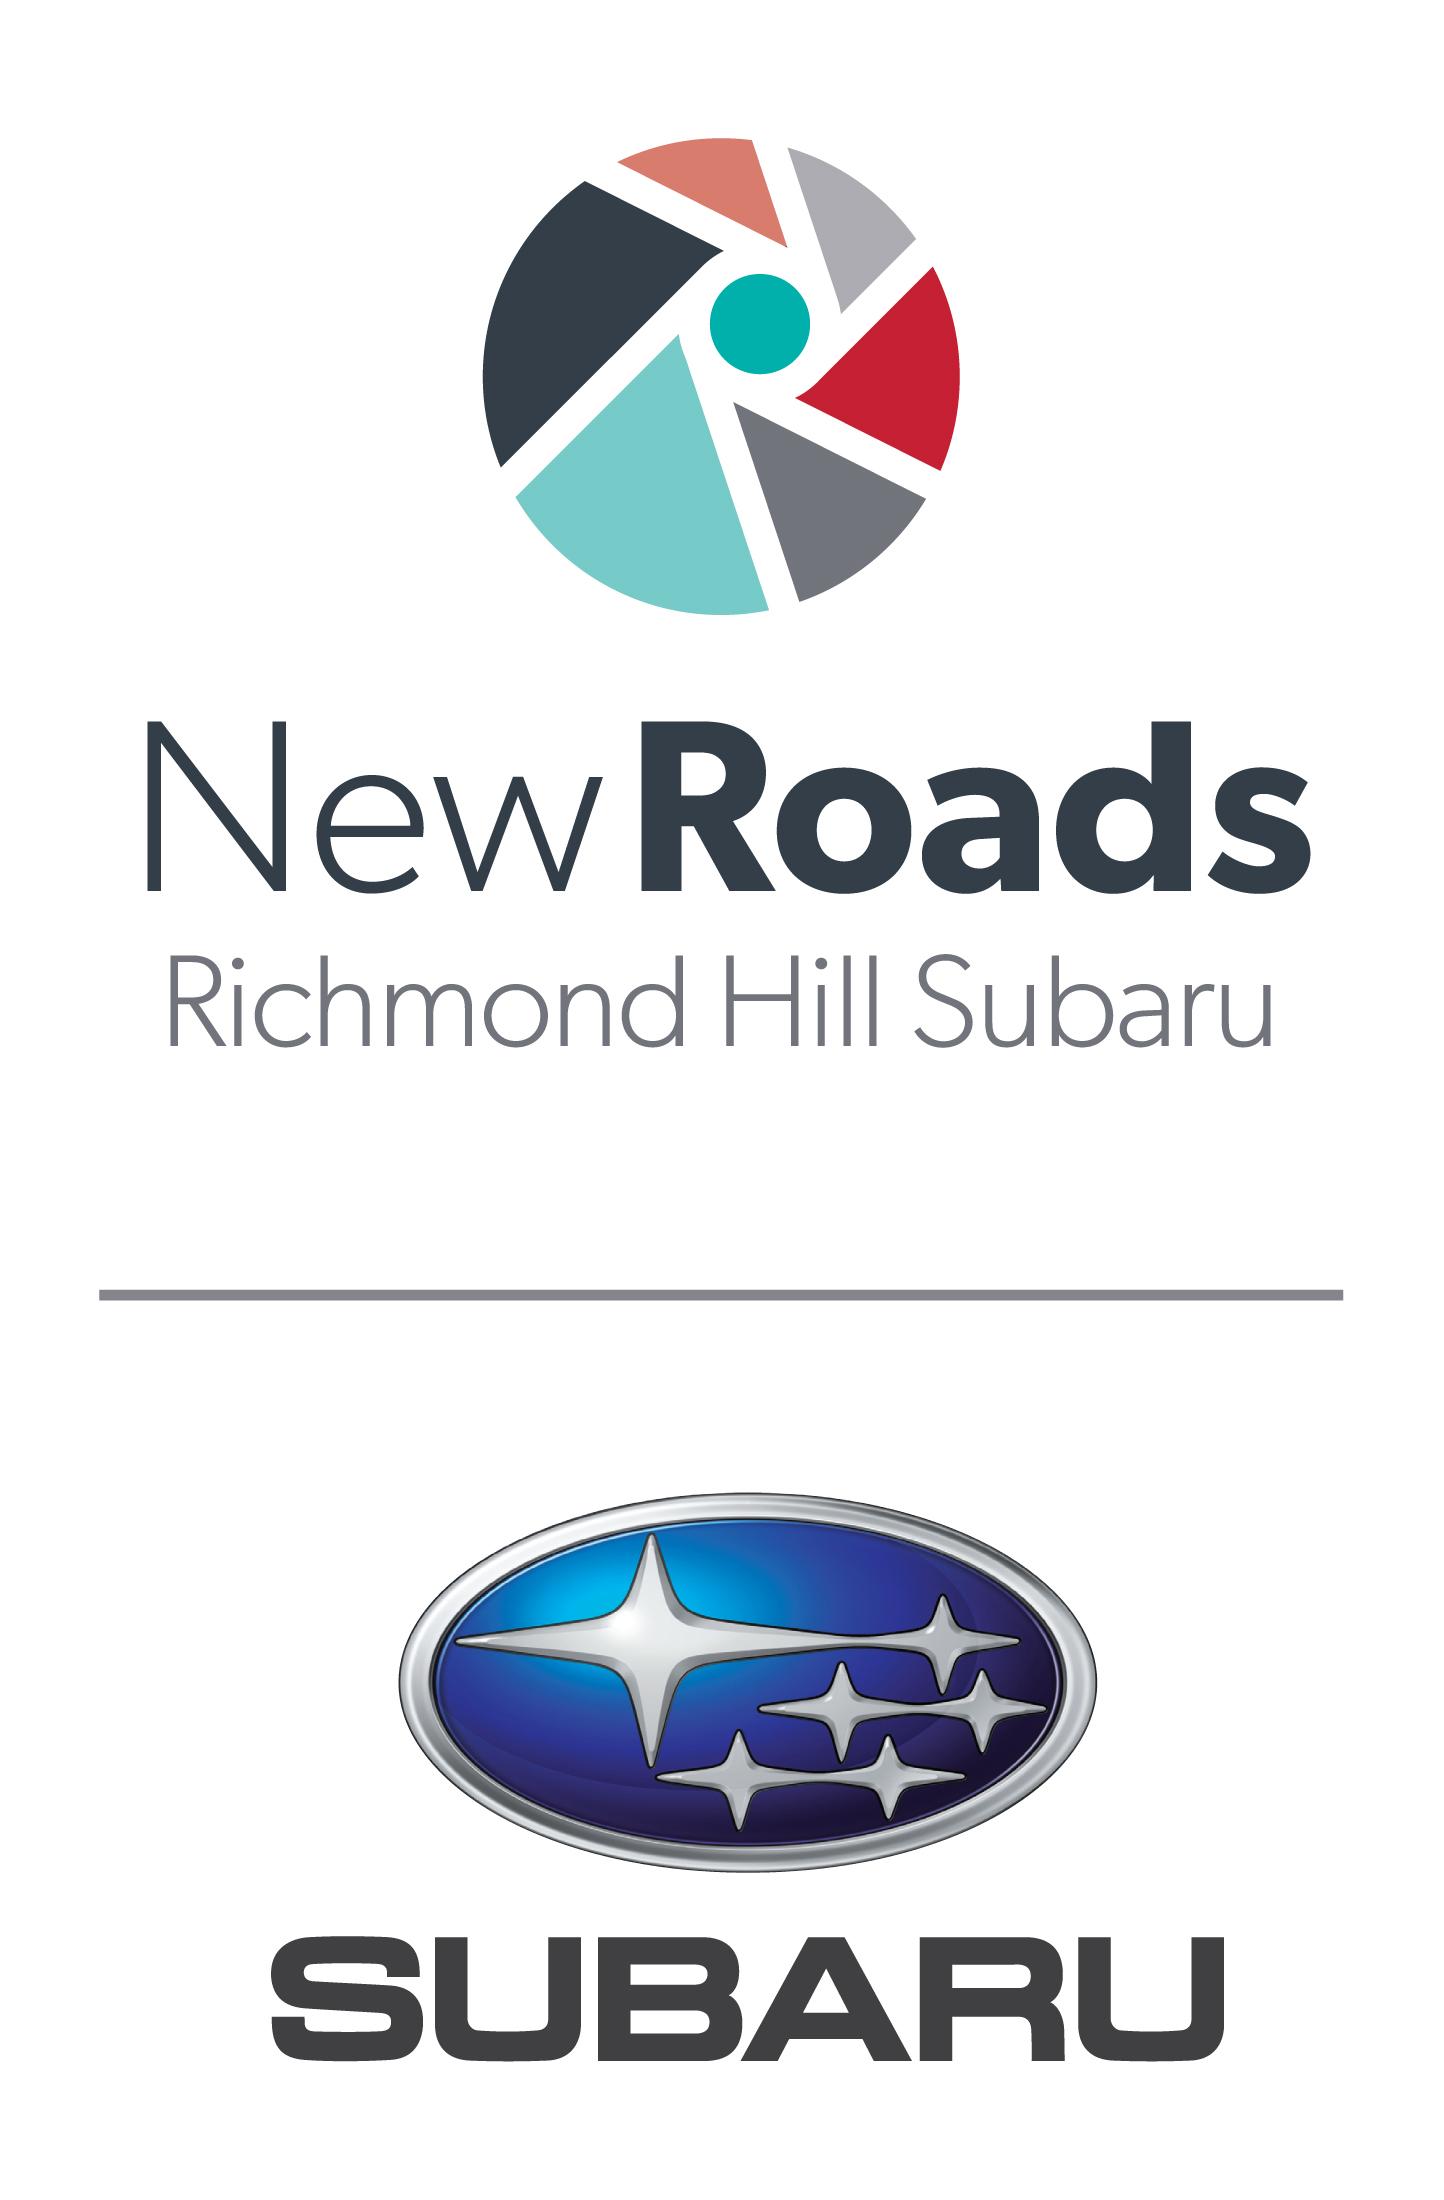 NewRoads Richmond Hill Subaru